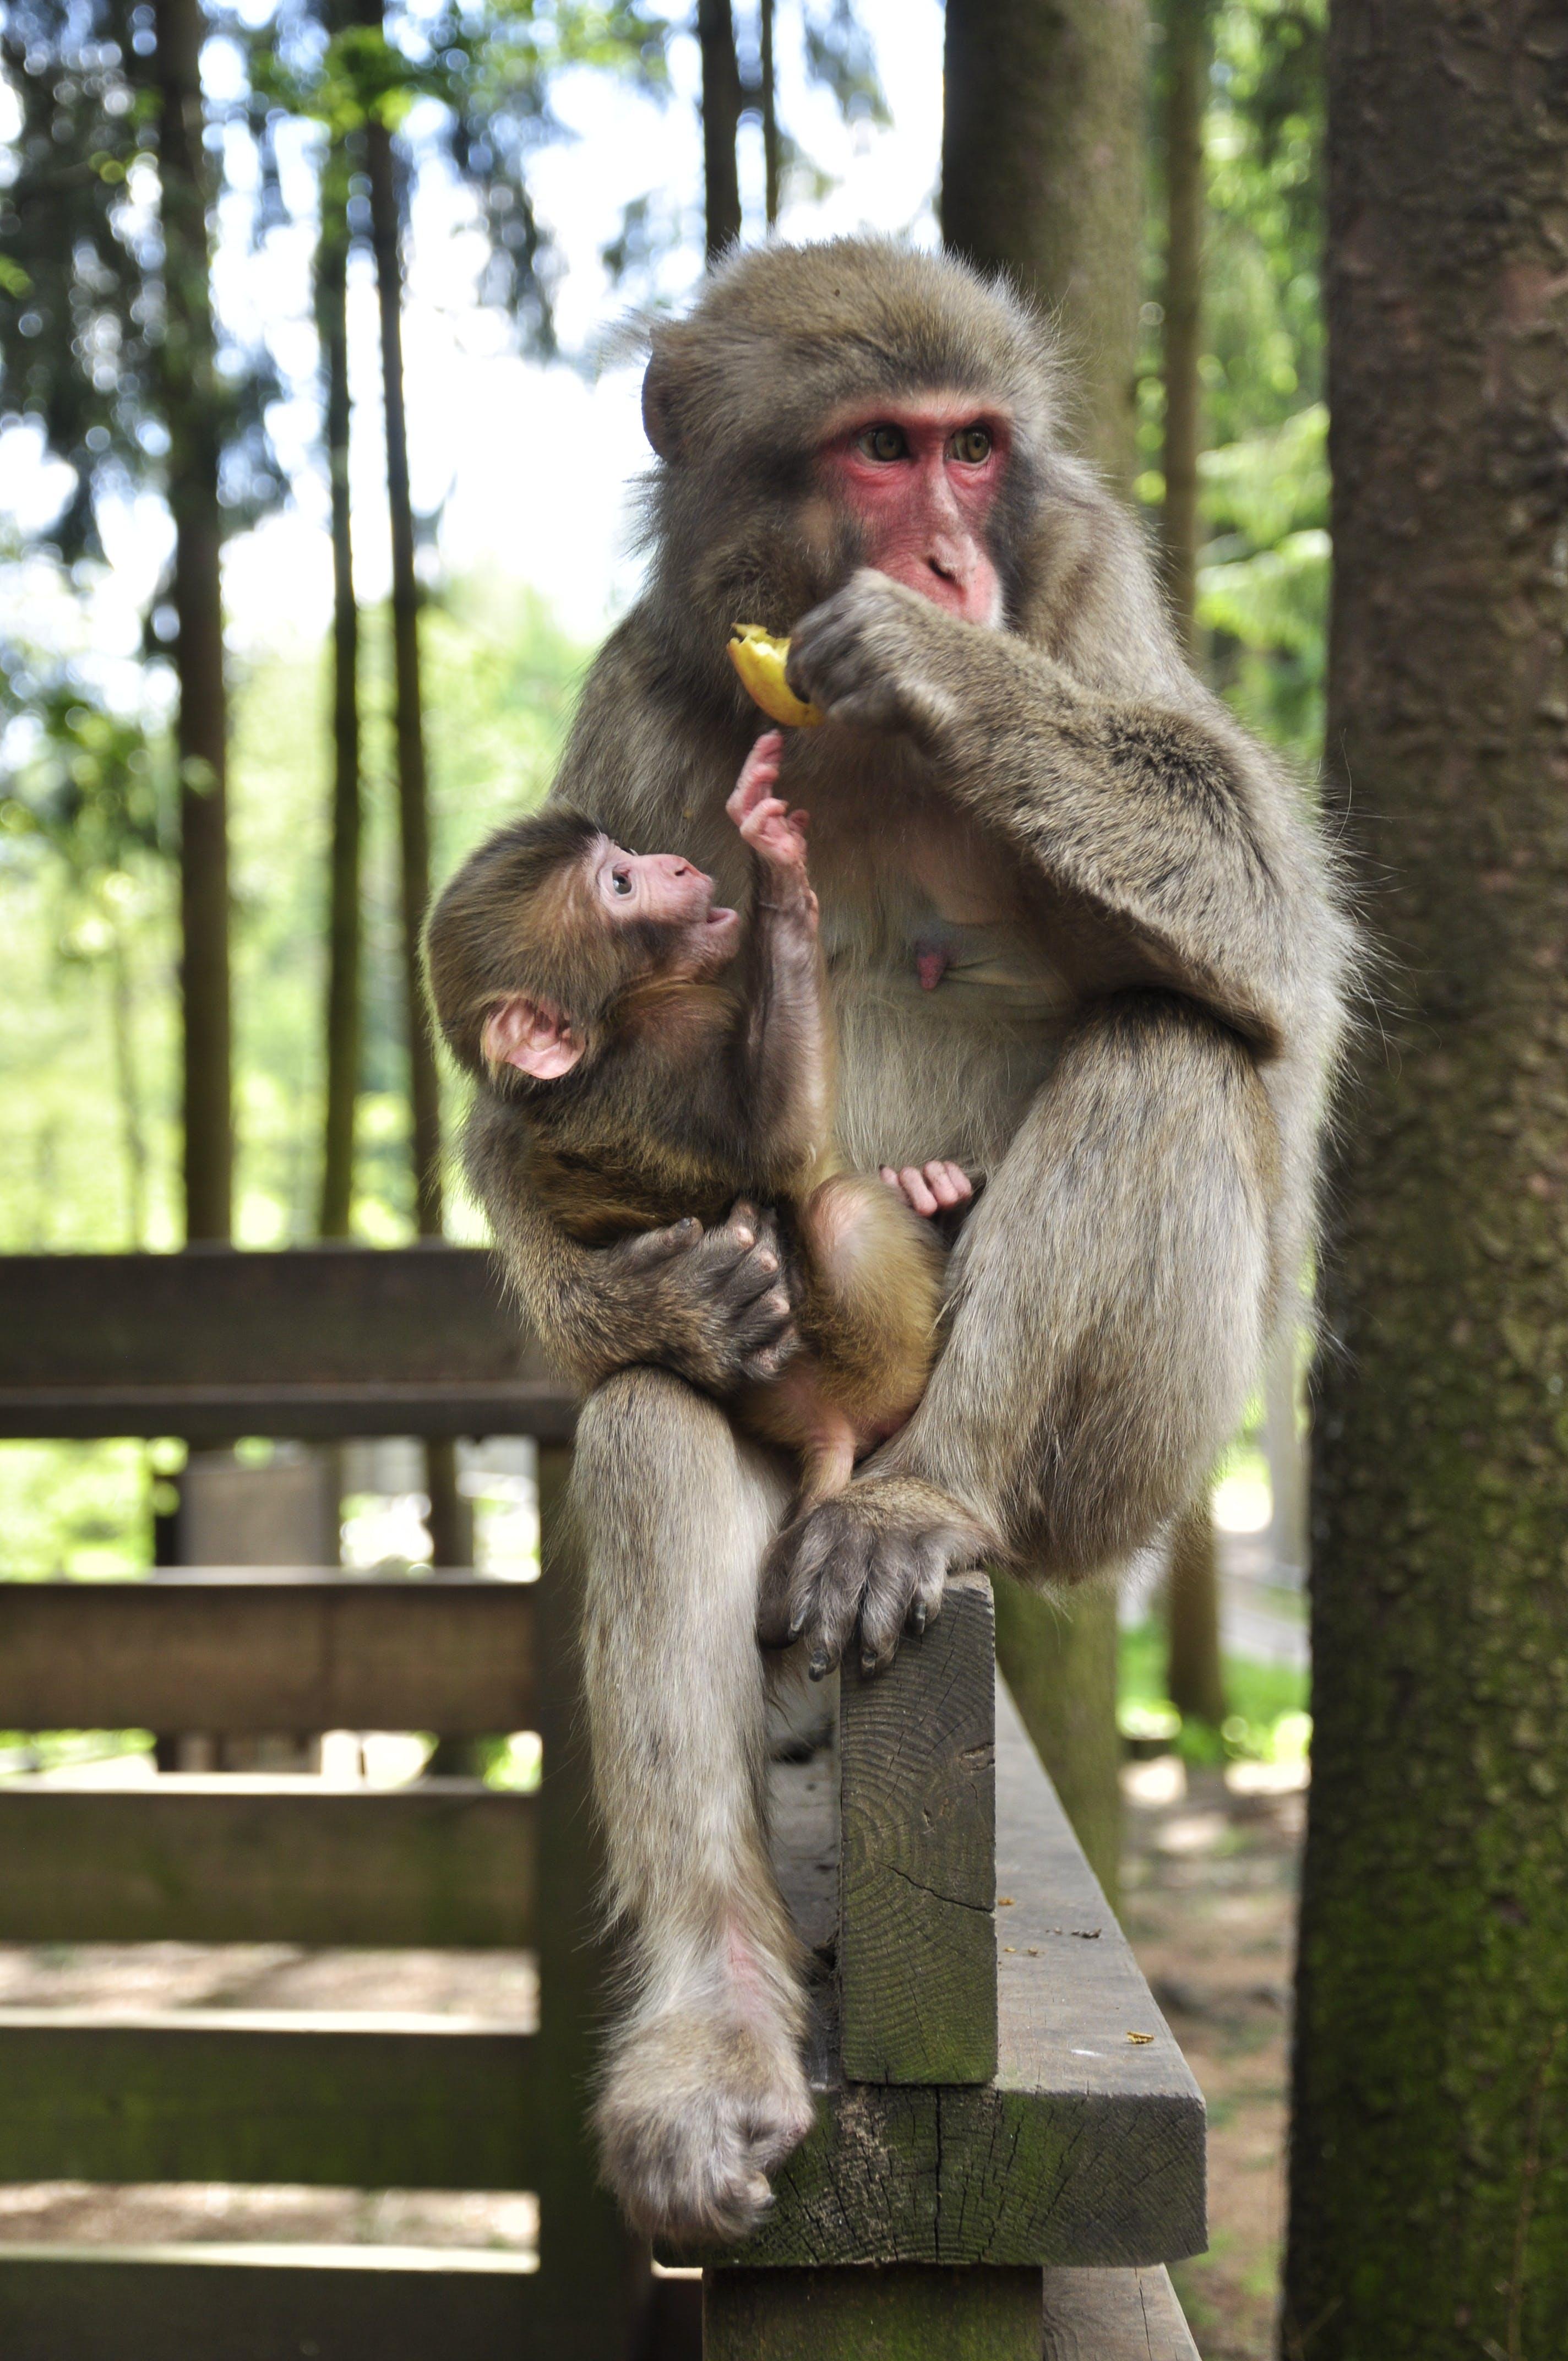 Free stock photo of animal, food, monkey